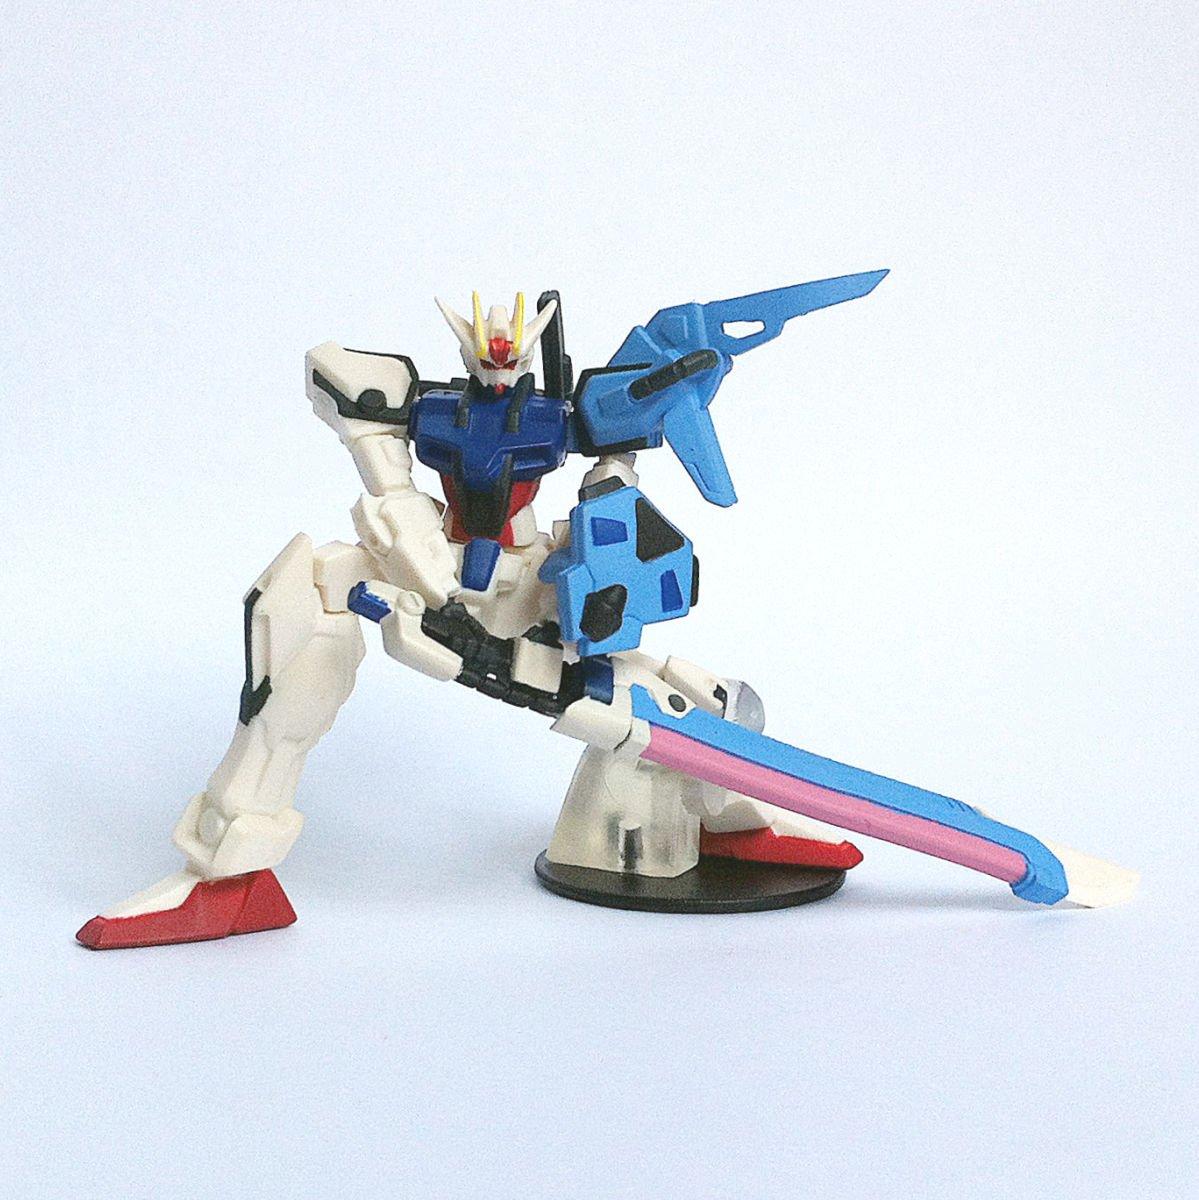 GAT-X105+AQM/E-X02 Sword Strike Gundam from HG Gundam MS Selection by Bandai